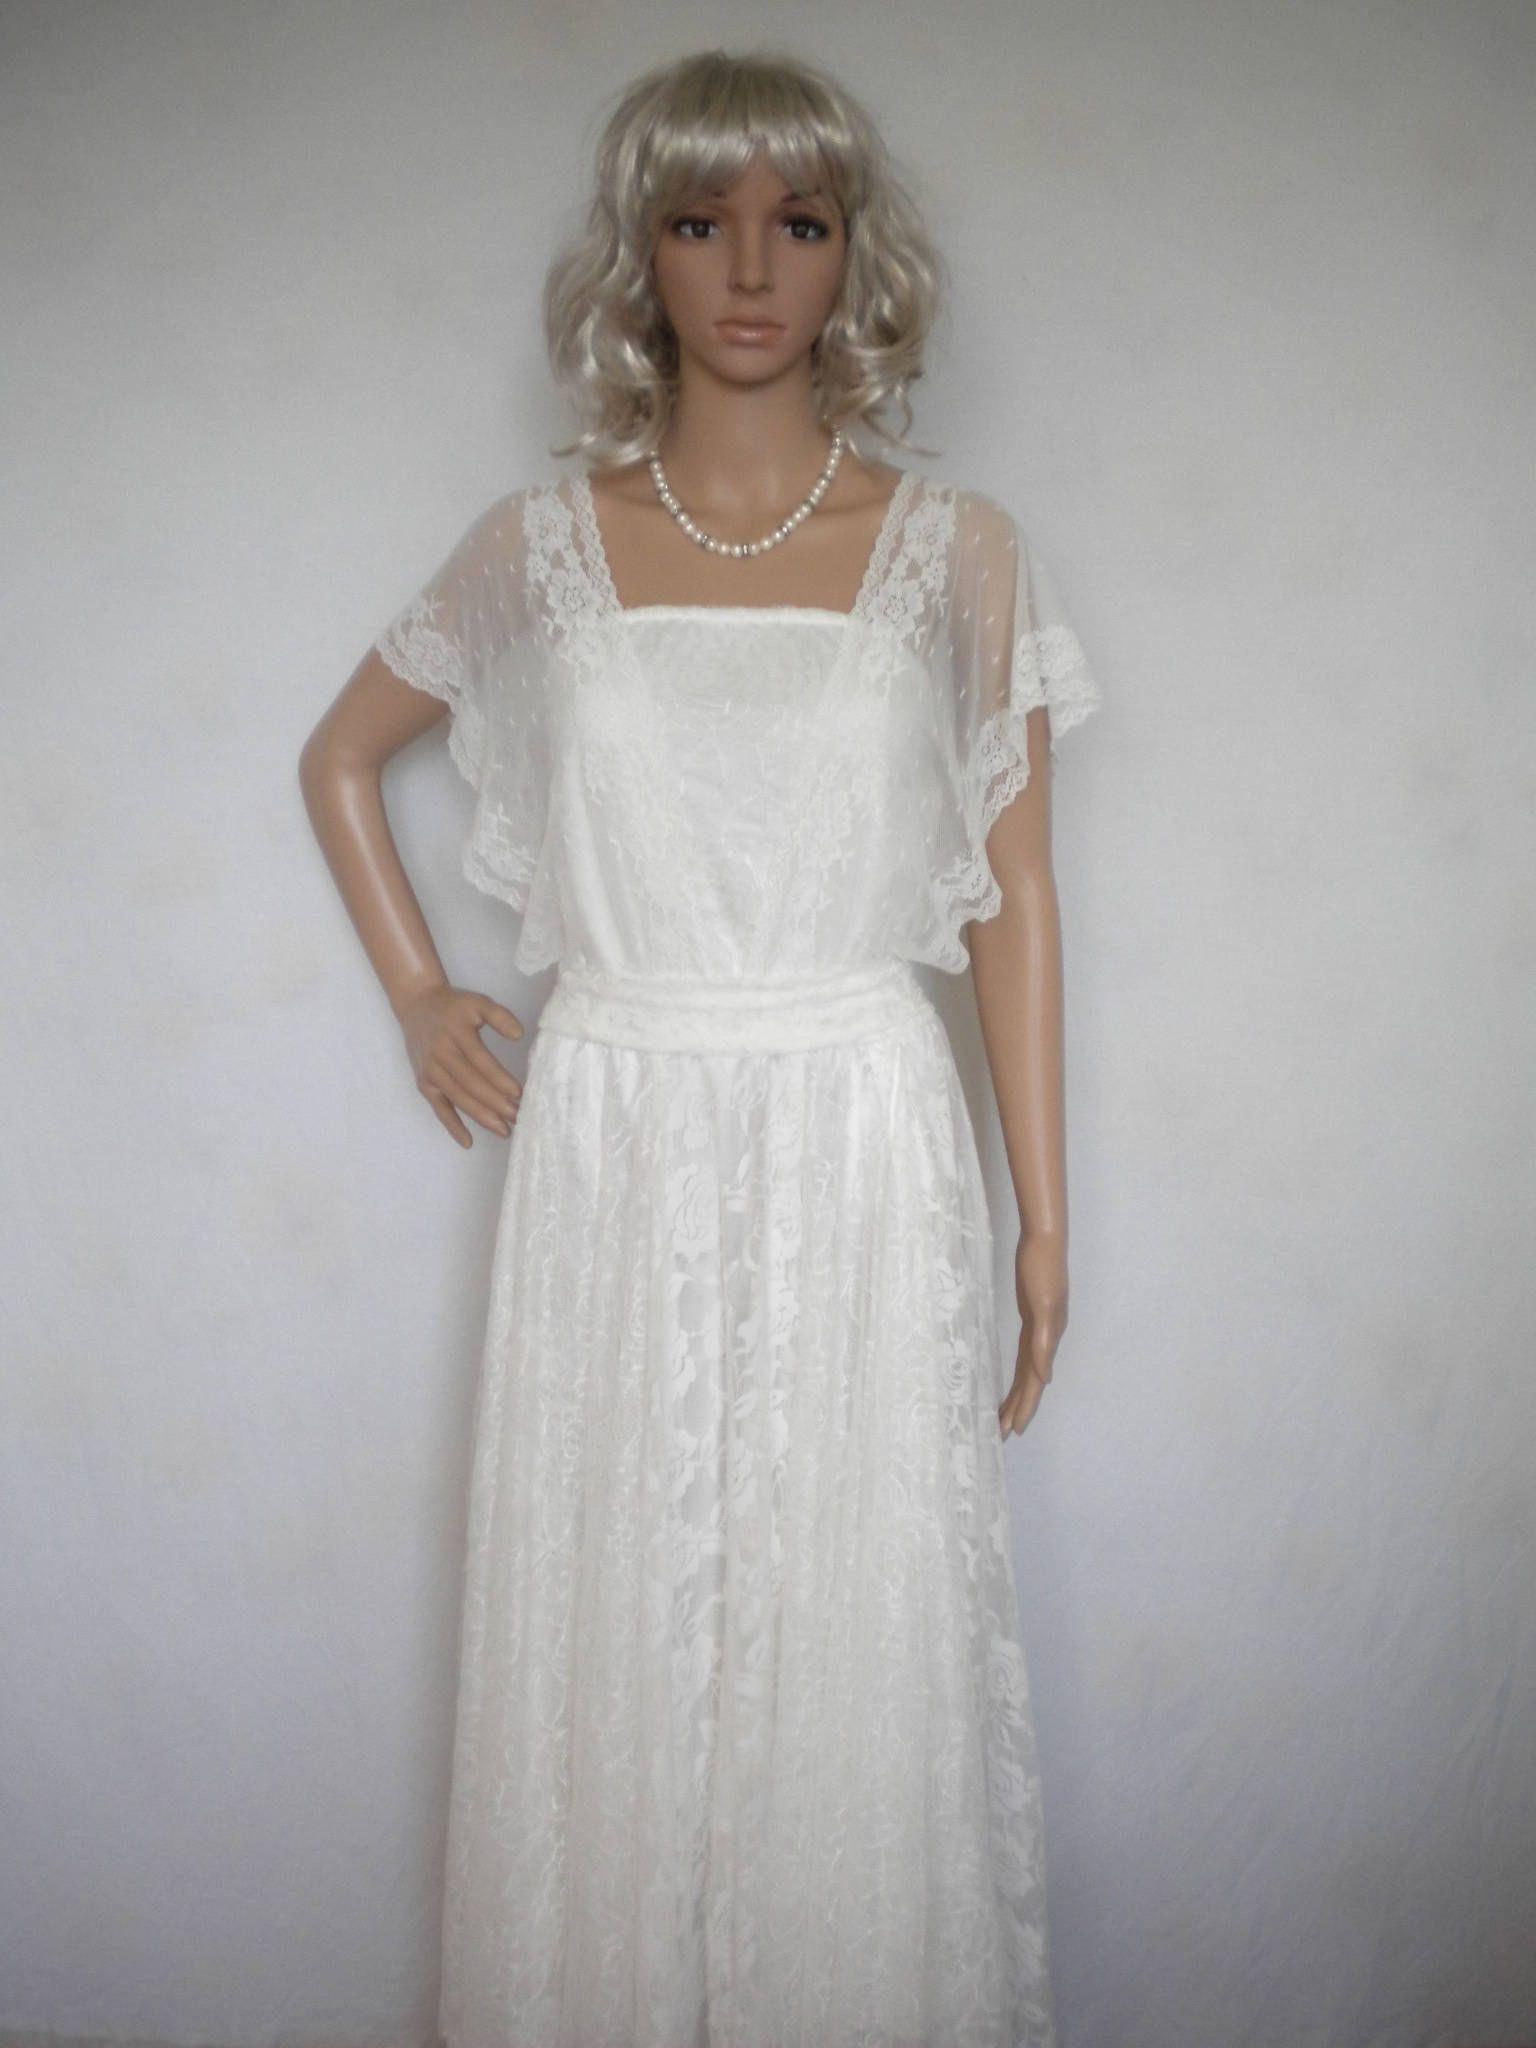 Romantic lace wedding dress faery beach wedding dress boho wedding ...